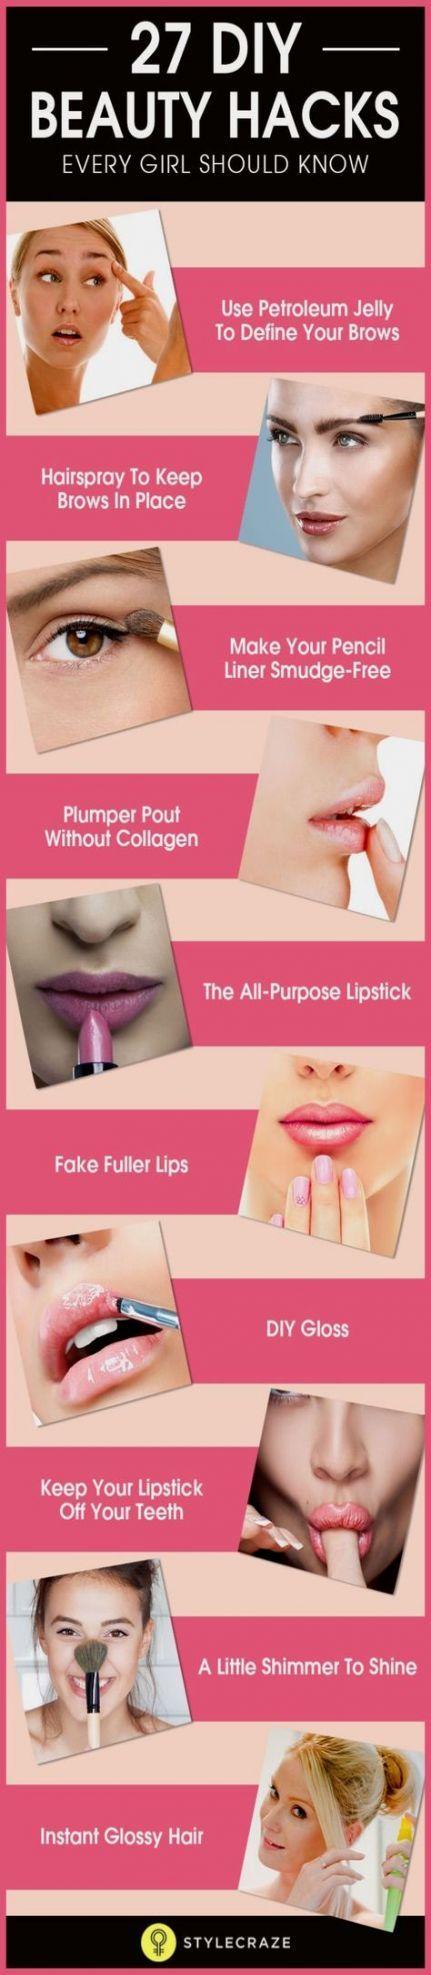 Makeup Tips And Tricks Hacks Tutorials Diy Beauty 38